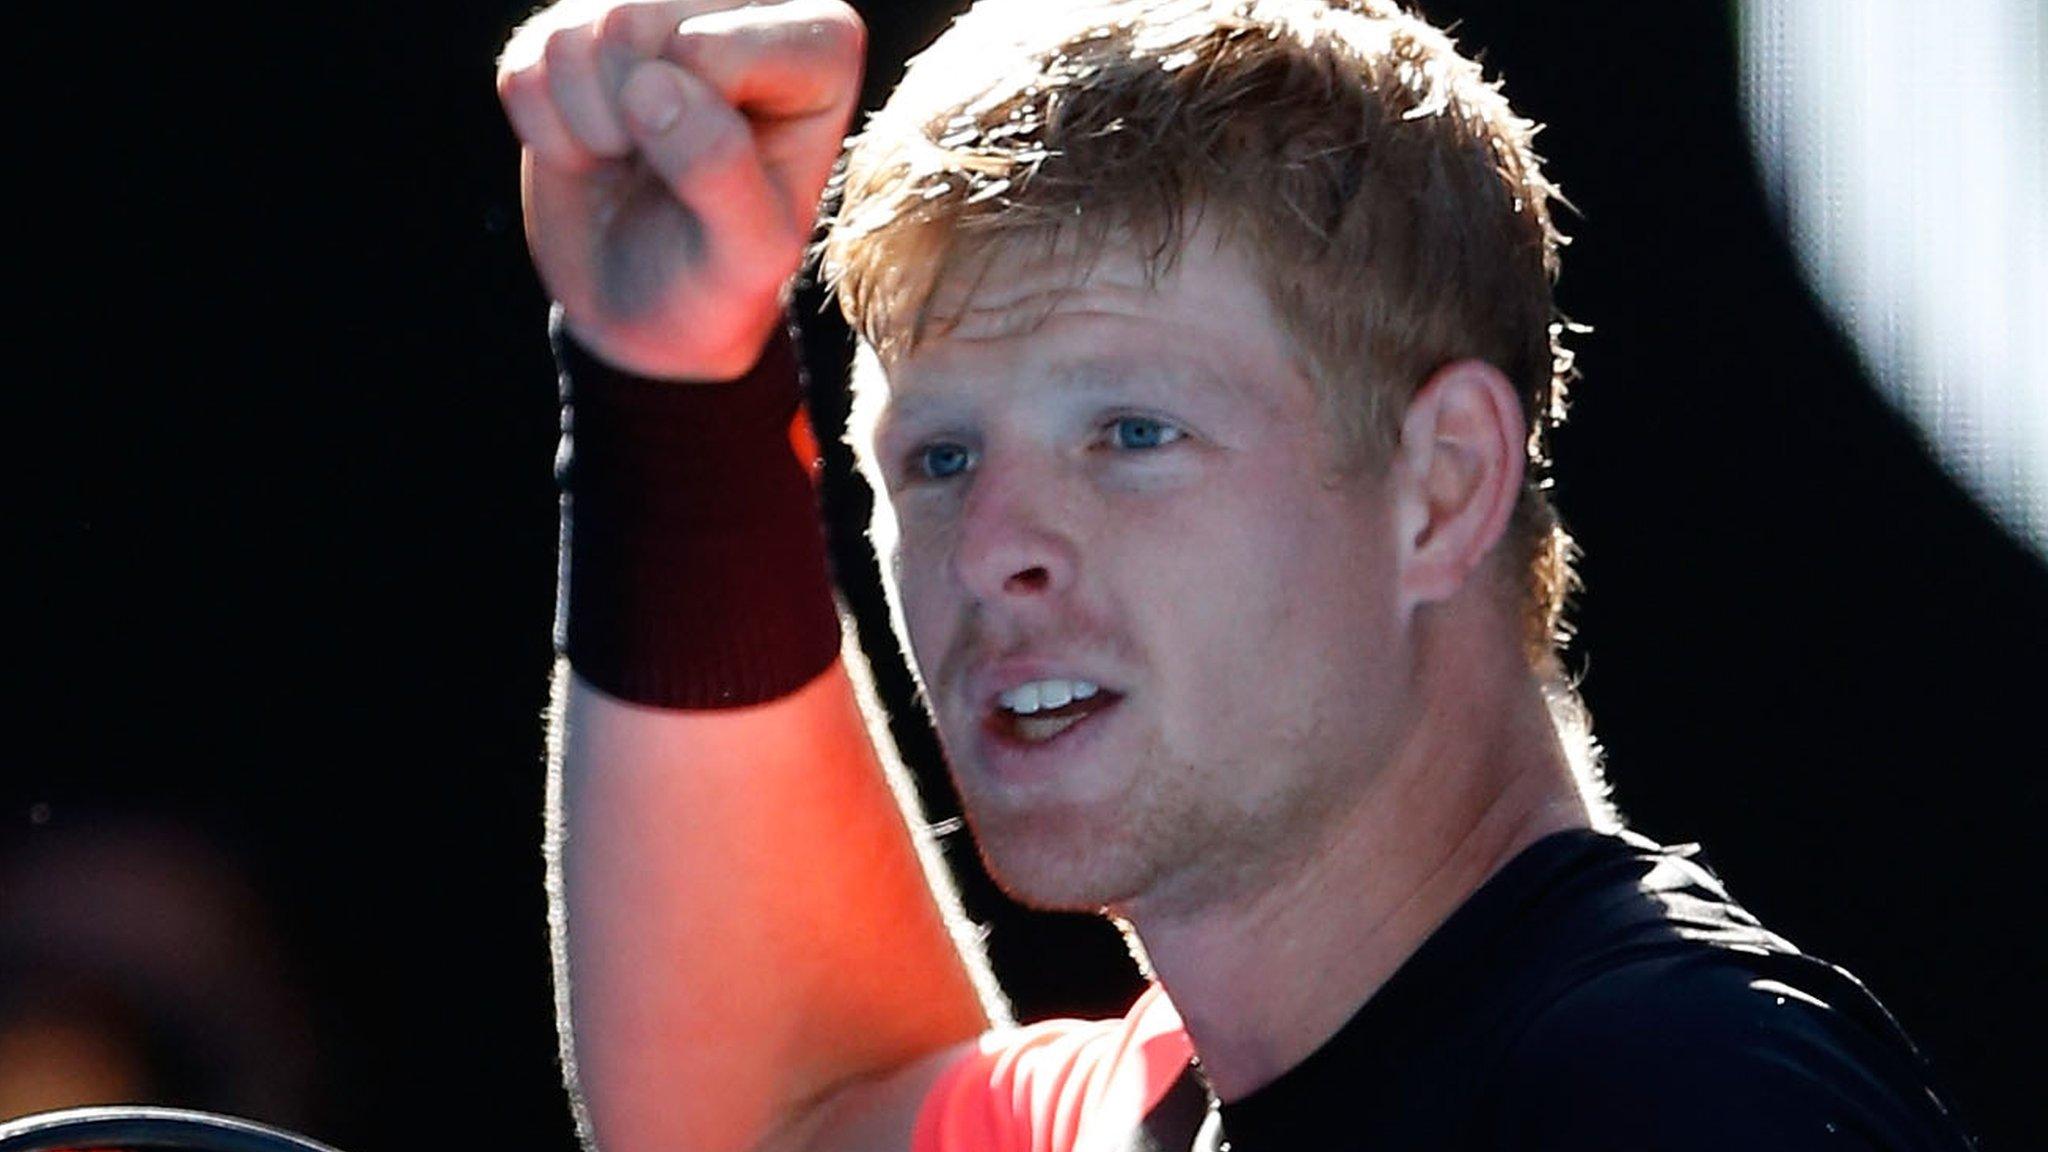 Edmund reaches Australian Open semi-finals